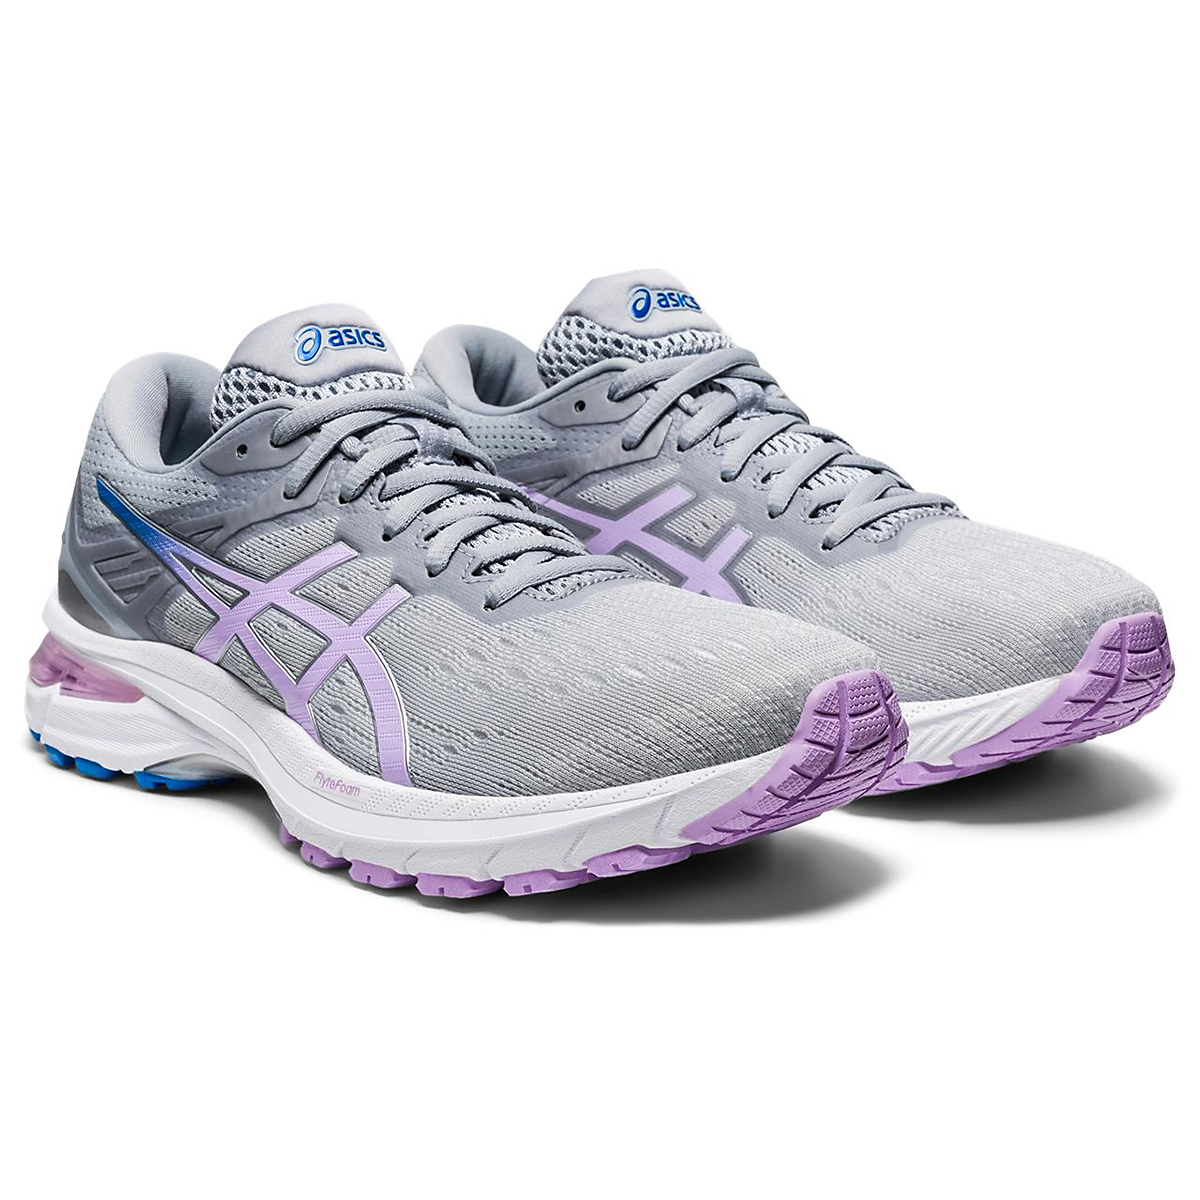 Women's Asics Gt-2000 9 Running Shoe - Color: Piedmont Grey - Size: 5 - Width: Regular, Piedmont Grey, large, image 3